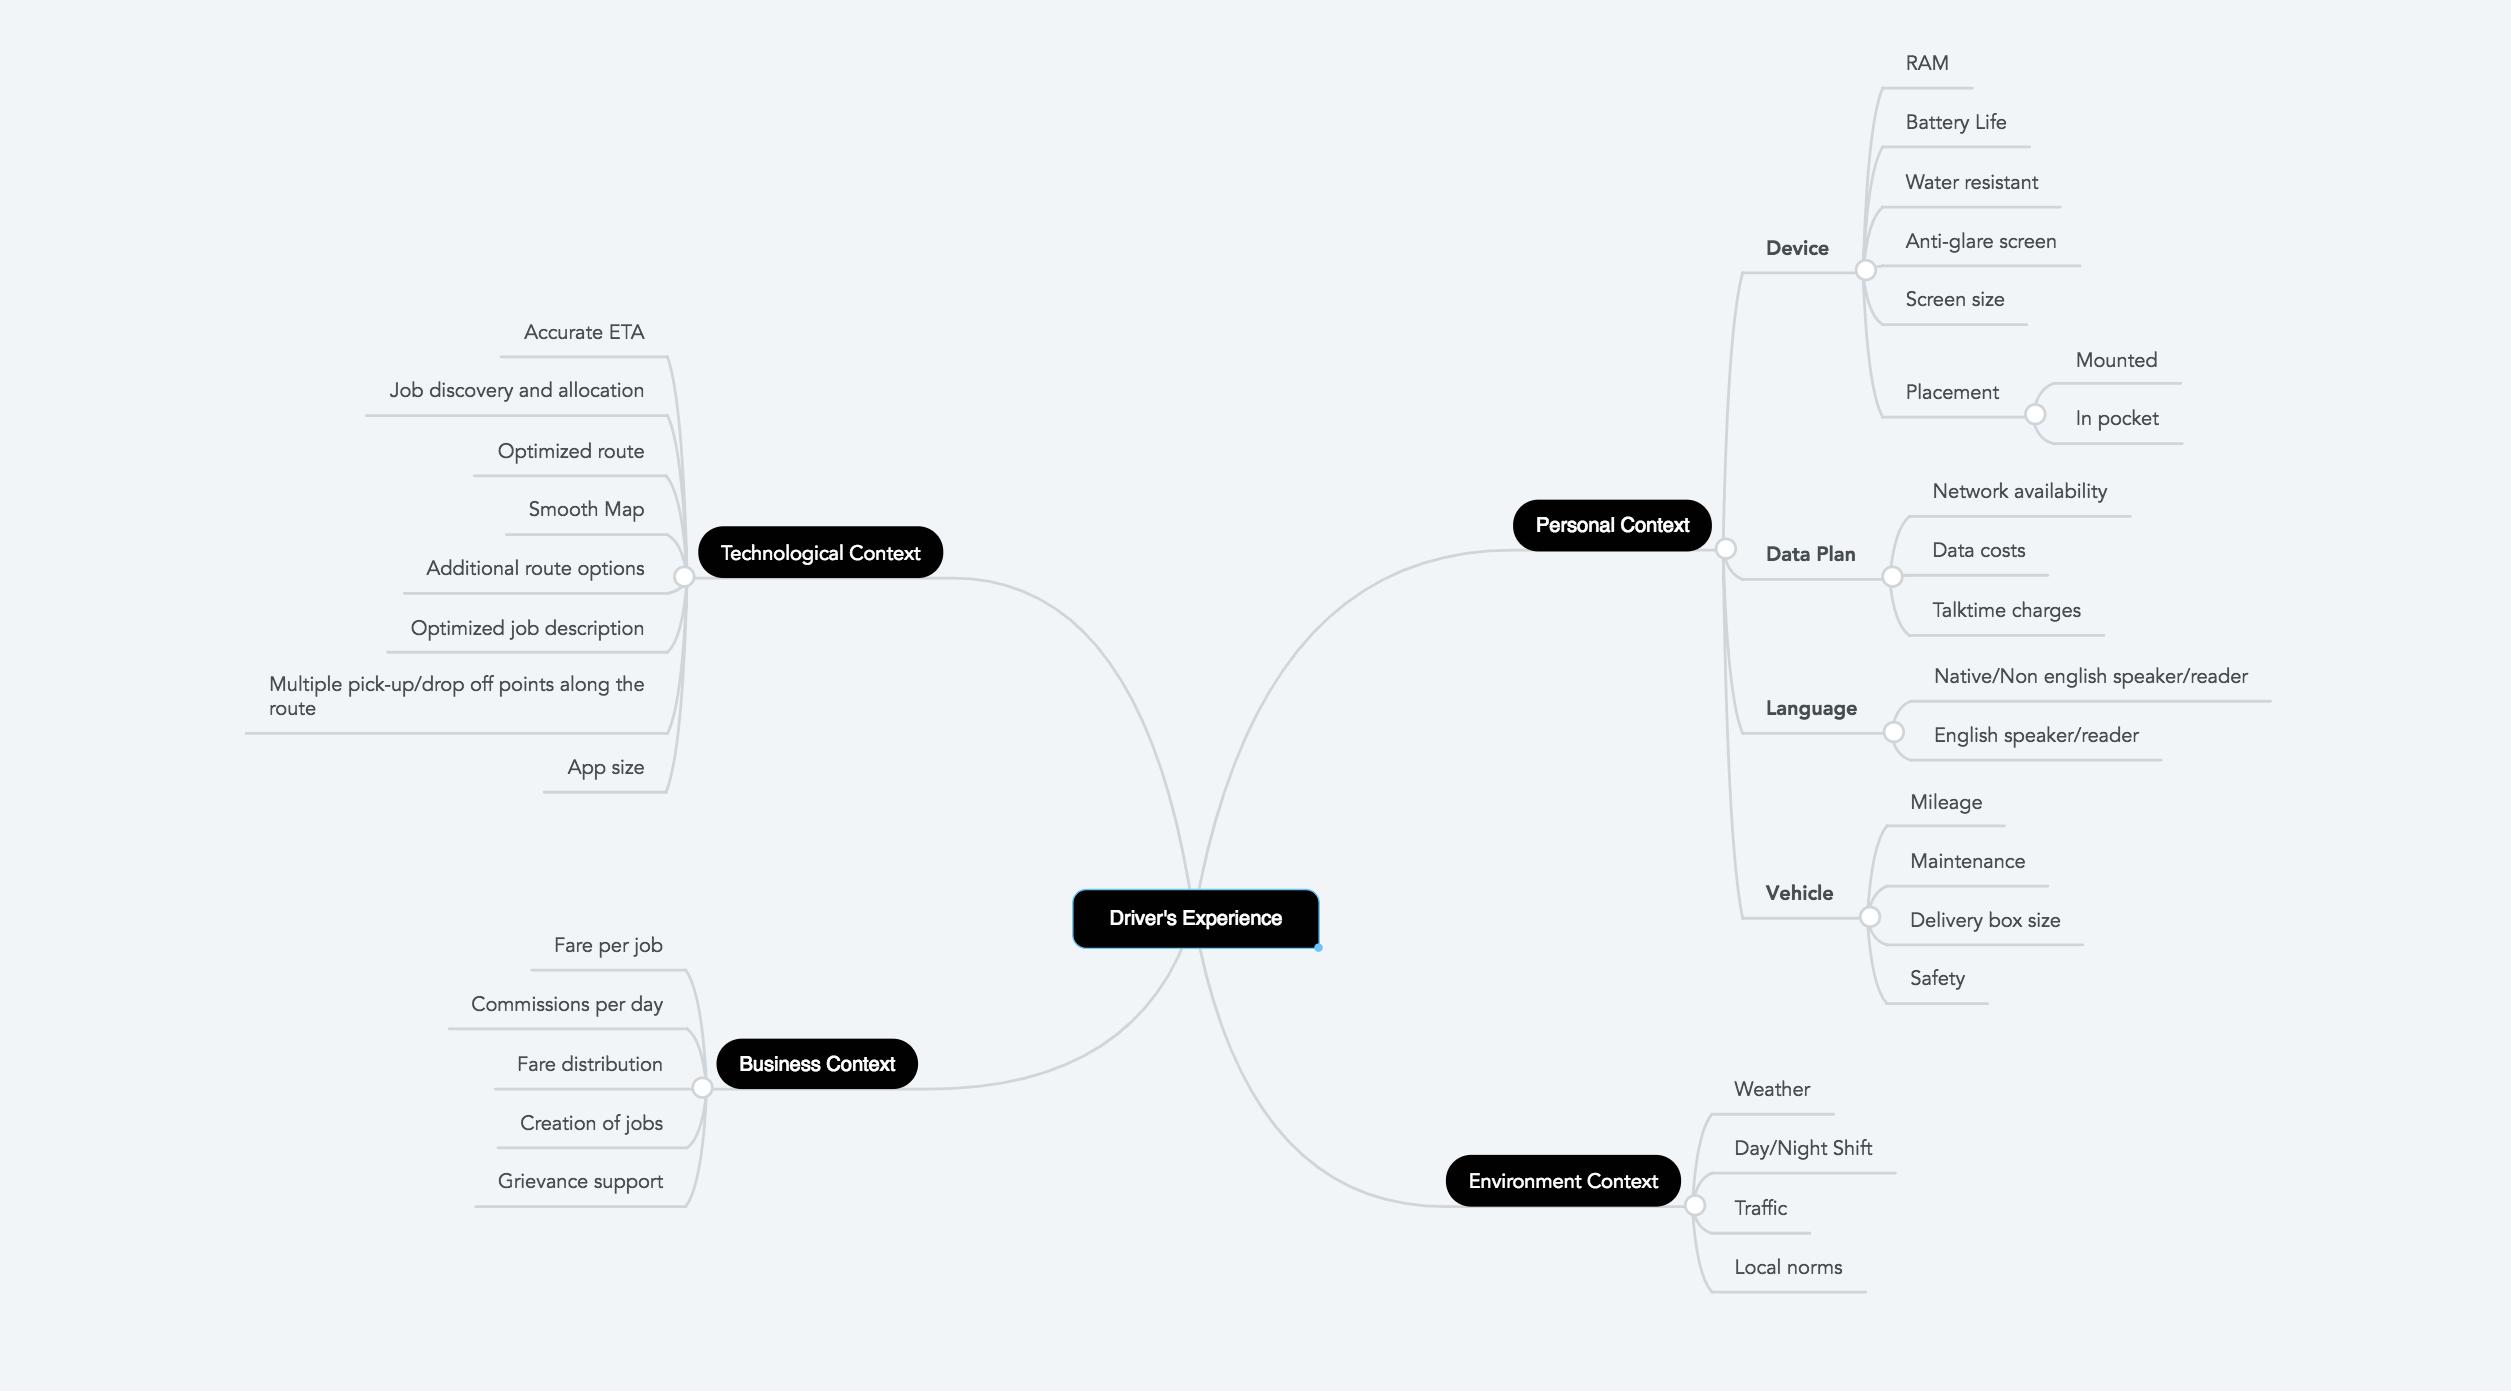 mind map اجرای پروژهی طراحی تجربه کاربری